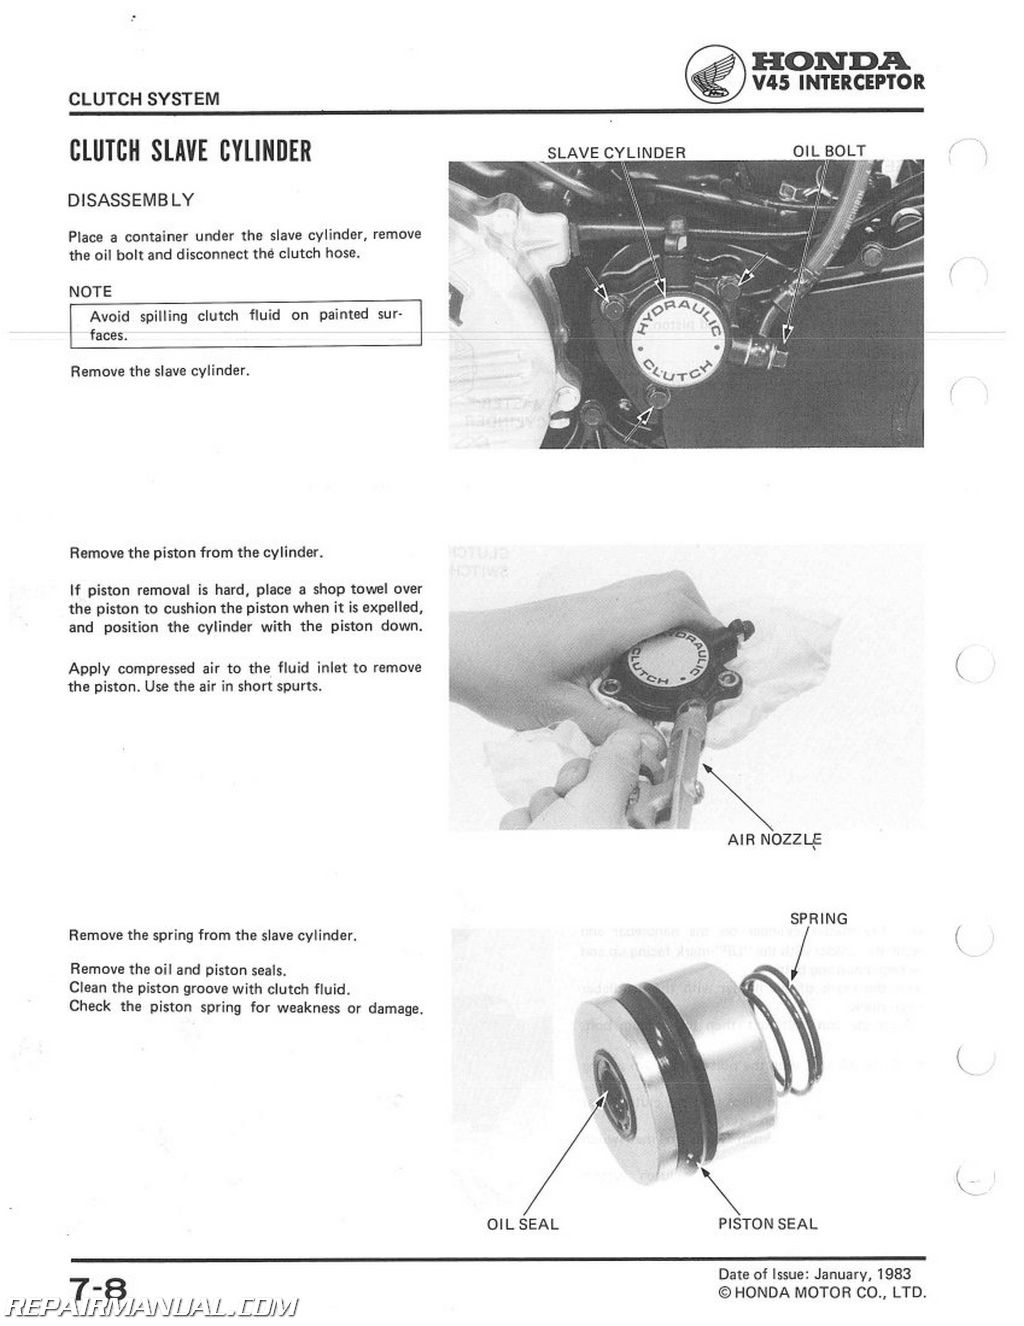 1983 1984 1985 honda vf700f vf750f interceptor motorcycle service manual rh repairmanual com